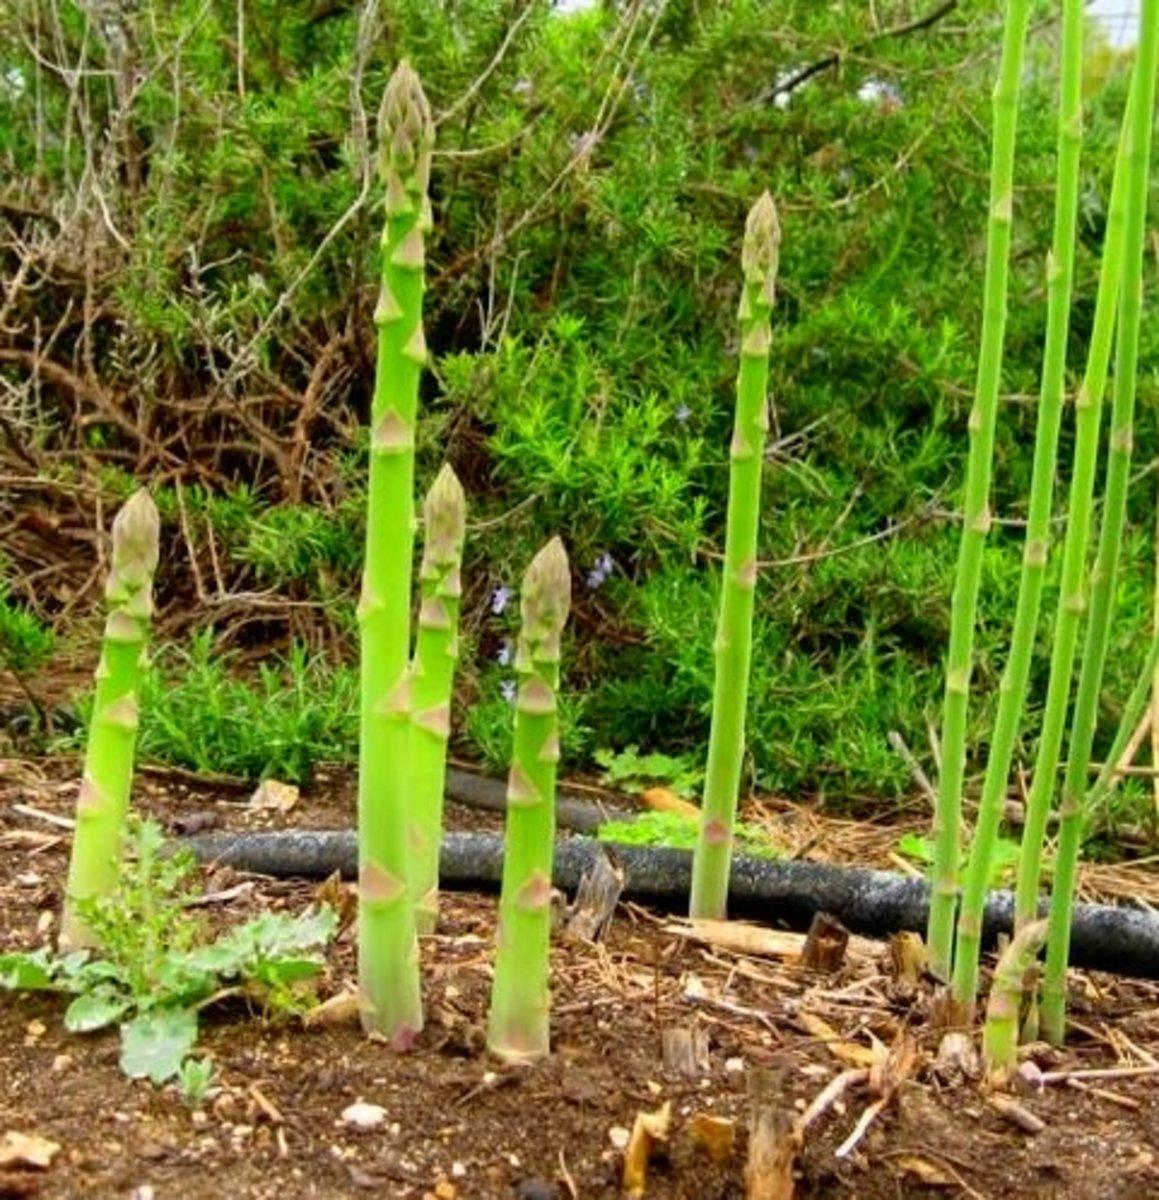 How to Grow Asparagus in Your Garden